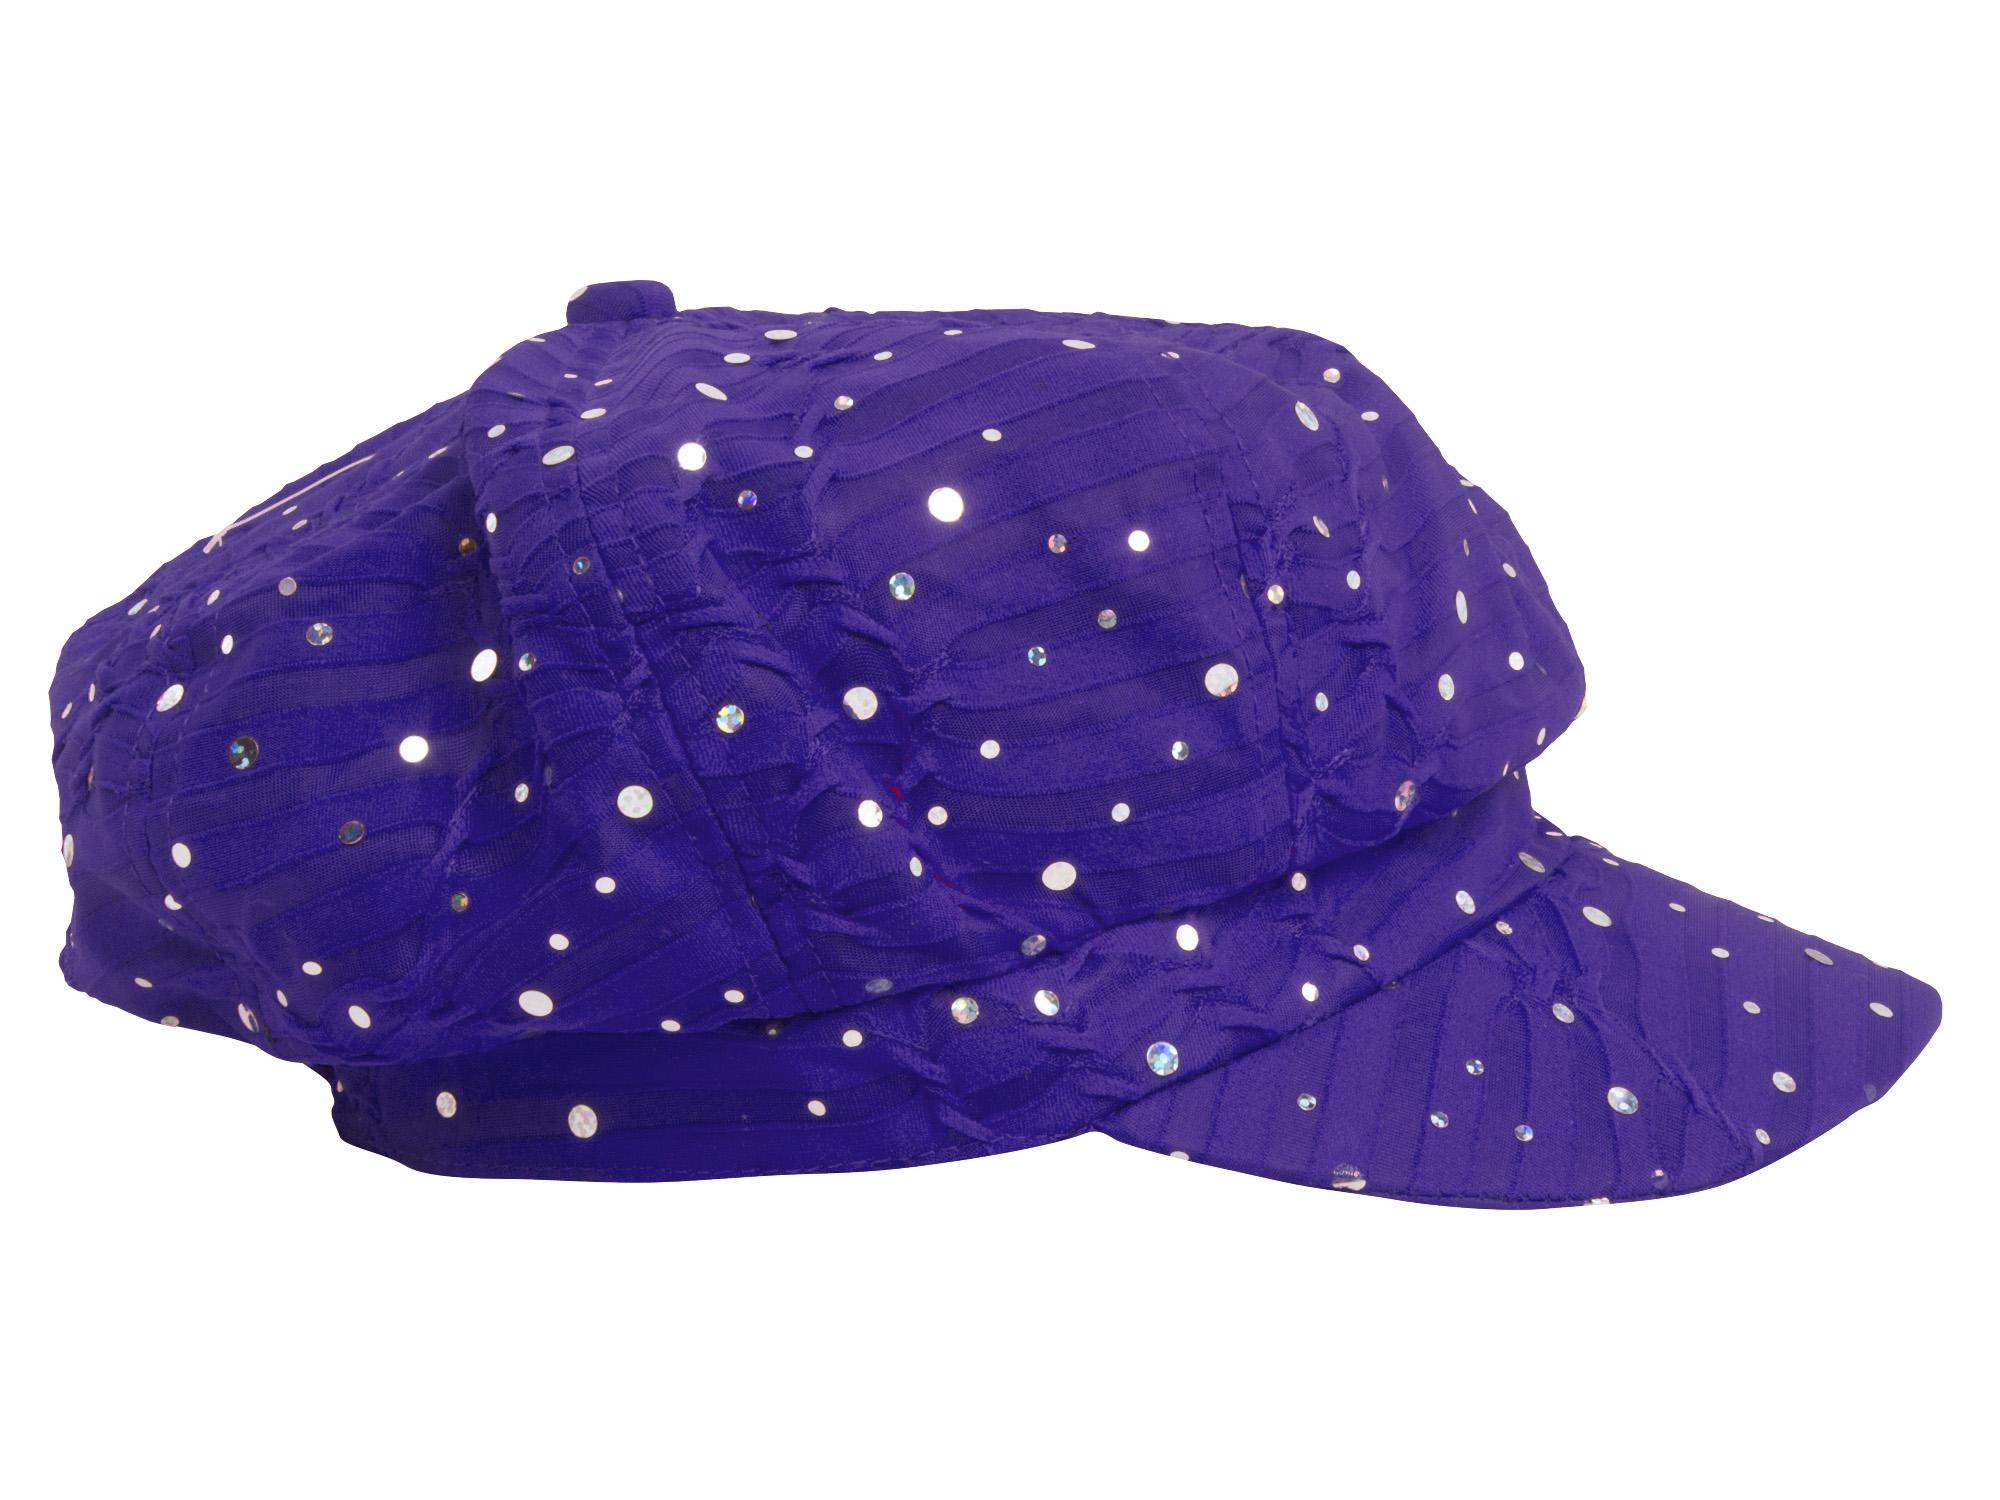 Women-039-s-Glitter-Sequin-Trim-Newsboy-Style-Relaxed-Fit-Hat-Cap thumbnail 23